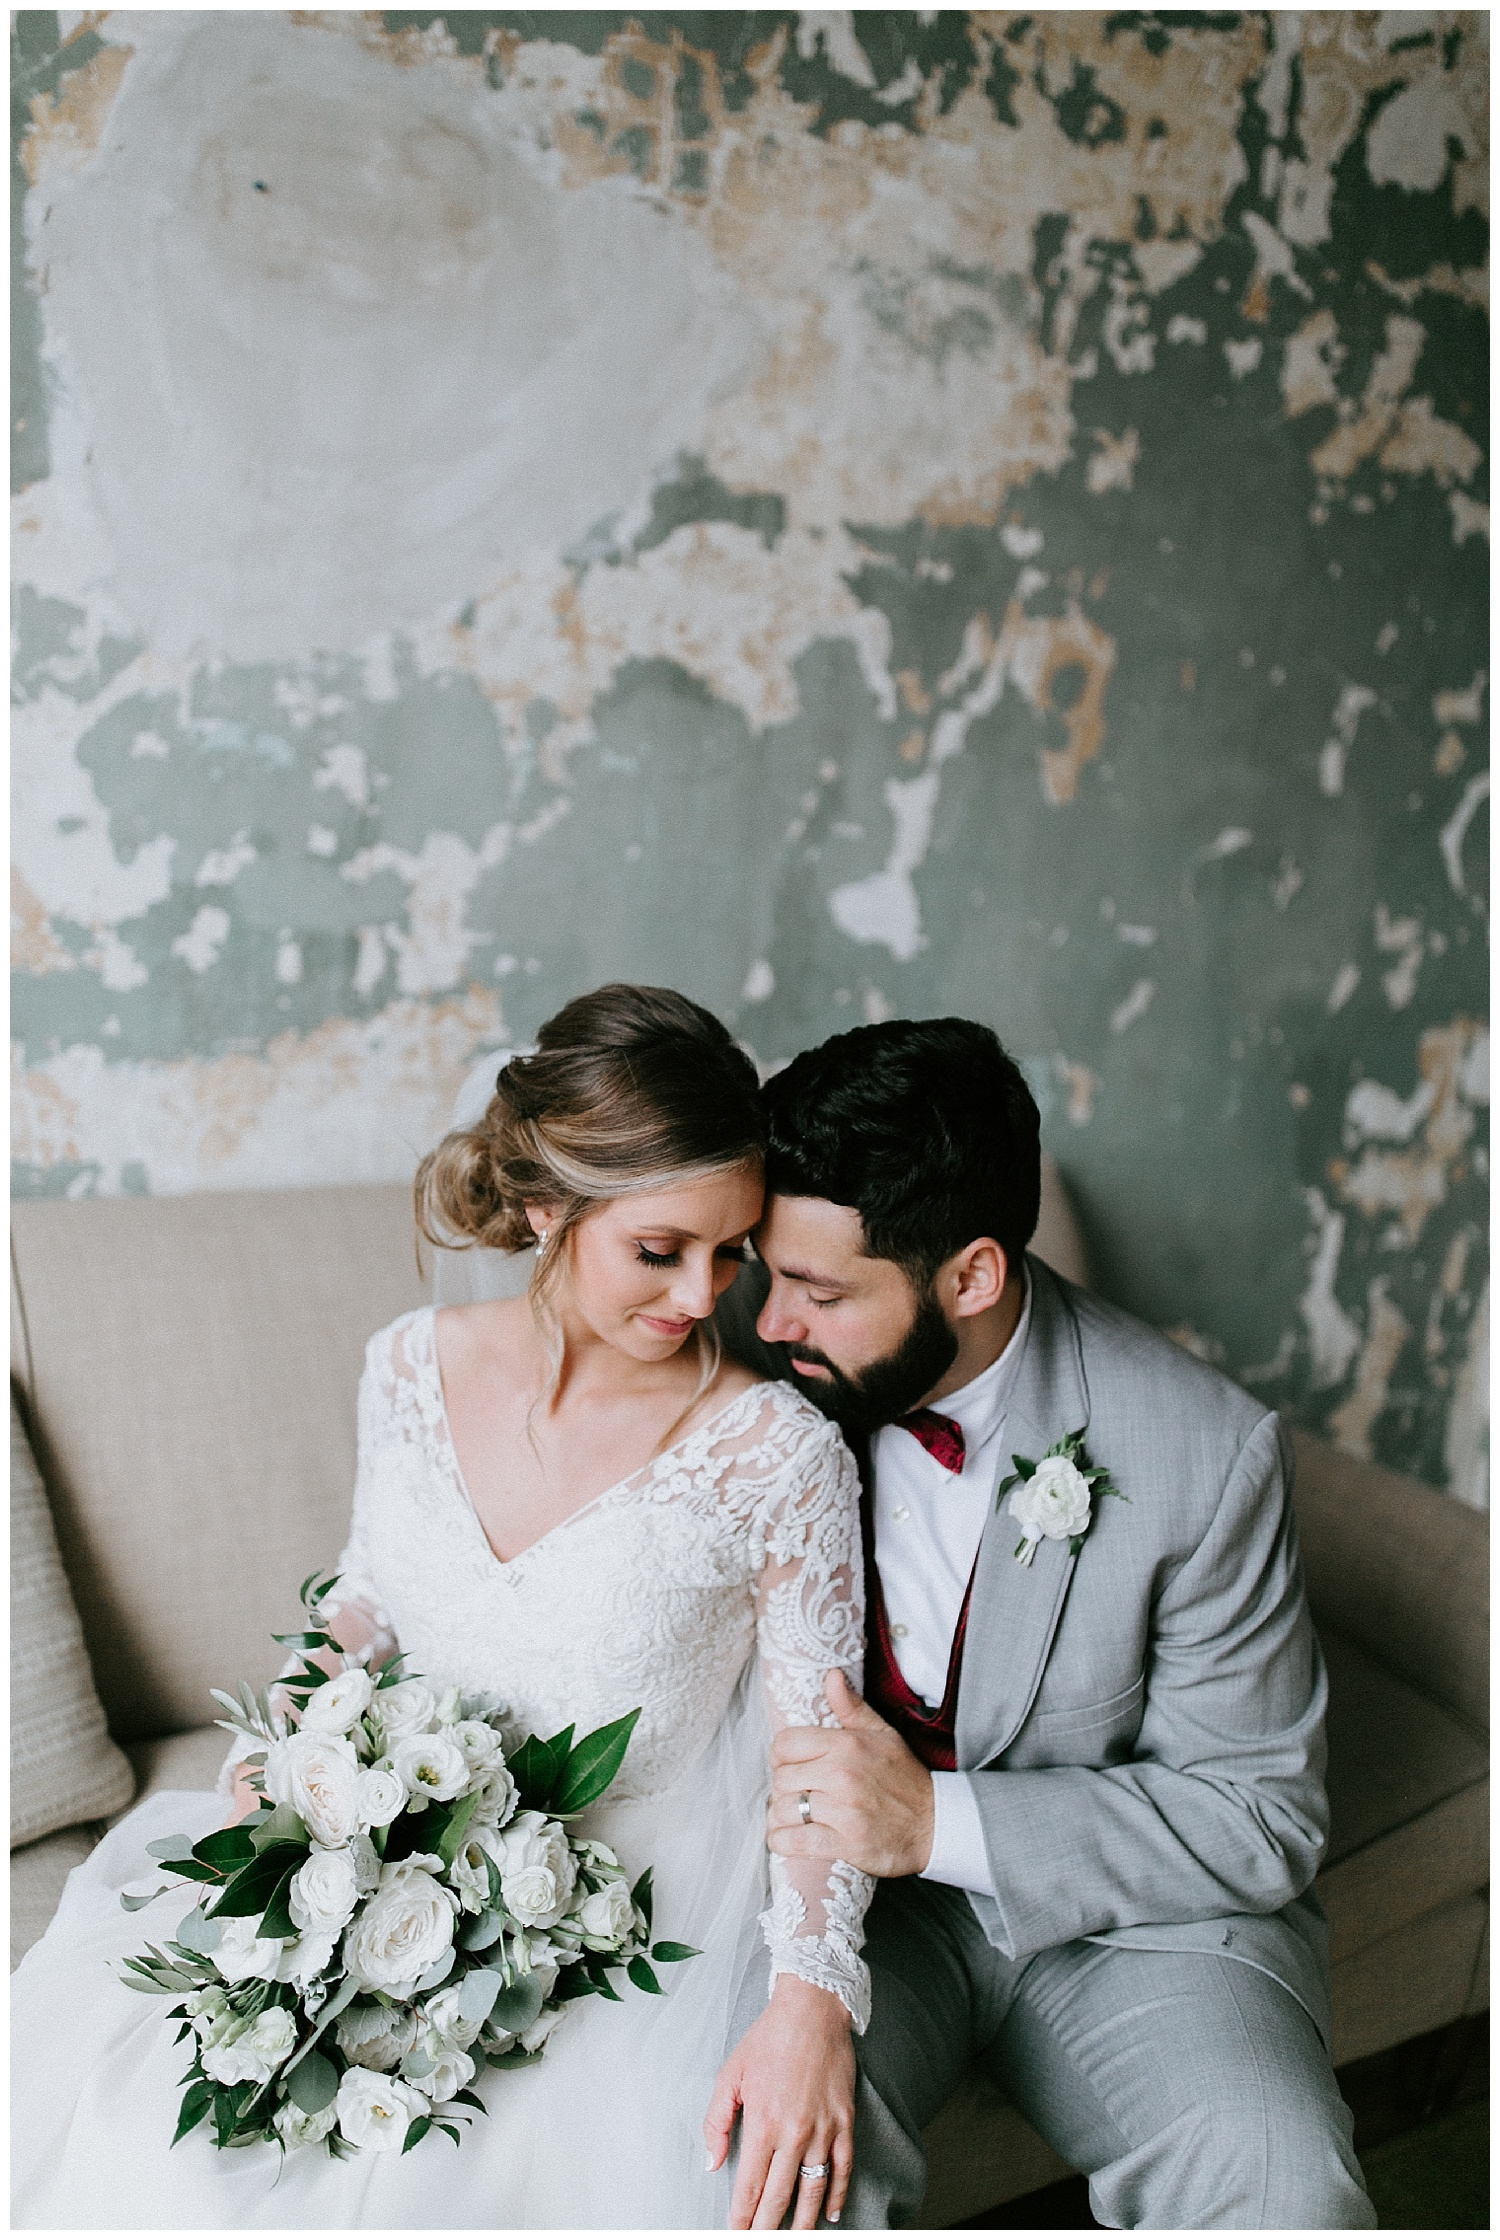 winter-wedding-the standard-knoxville_2019-01-23_0034.jpg